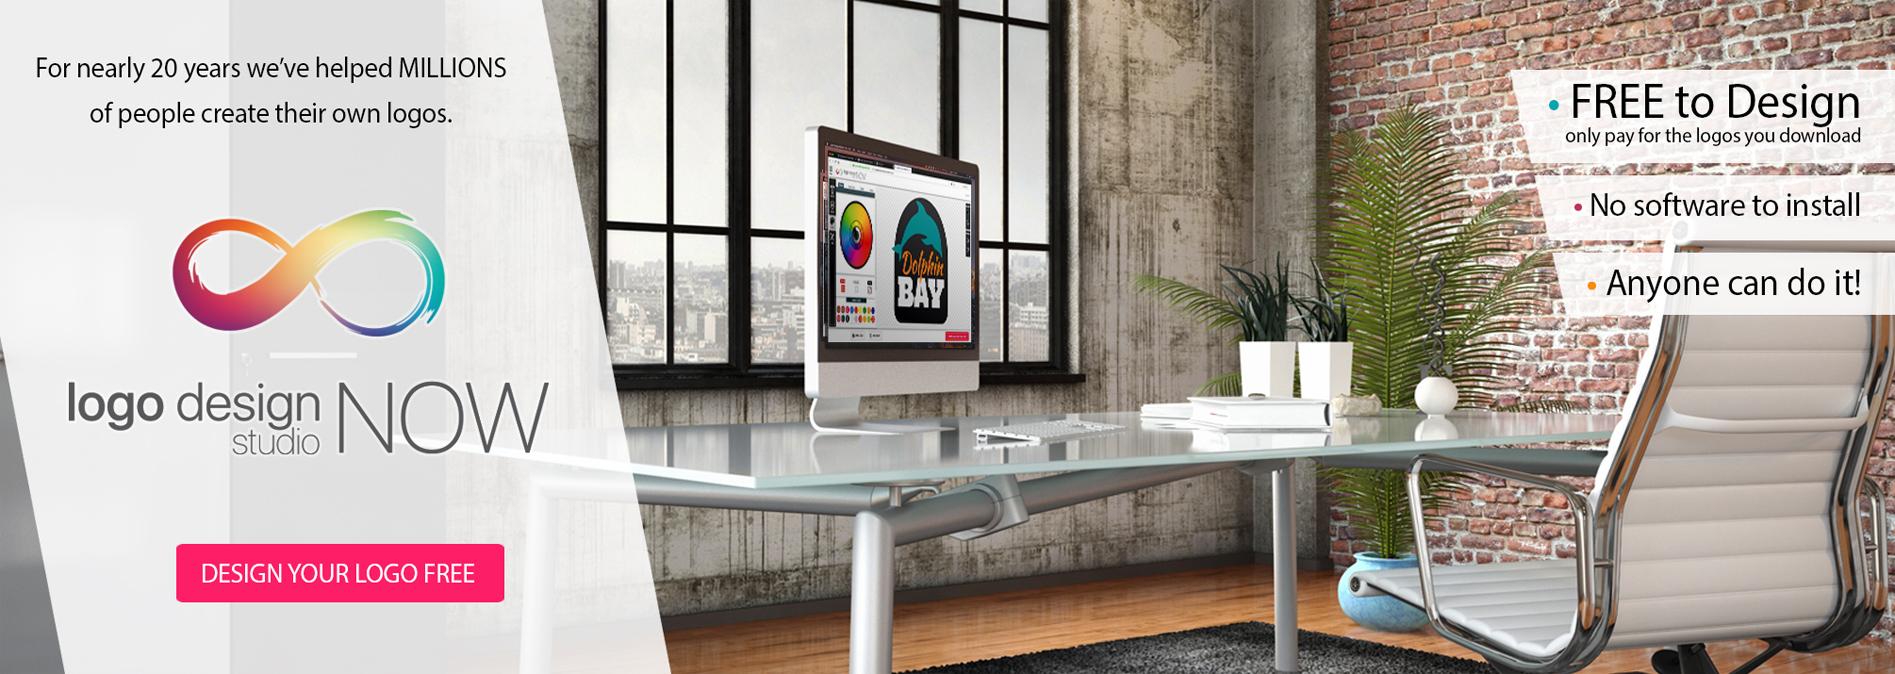 Logo Design Studio Now - Design for FREE